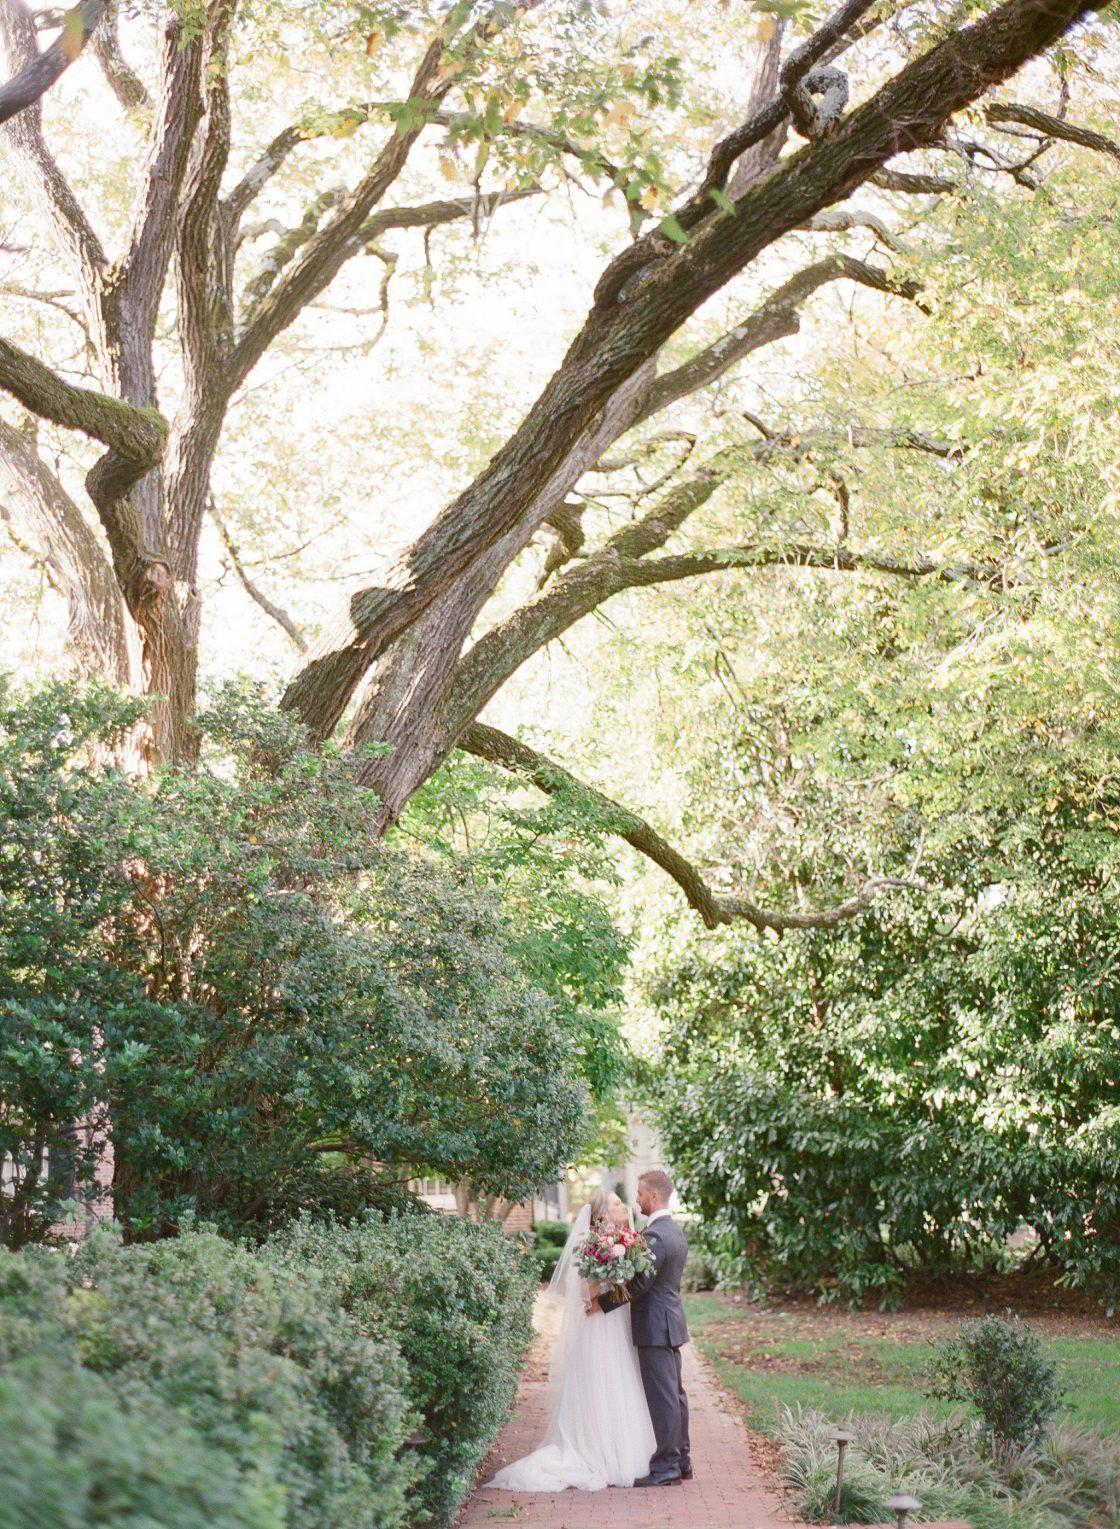 Romantic Southern Wedding Photo